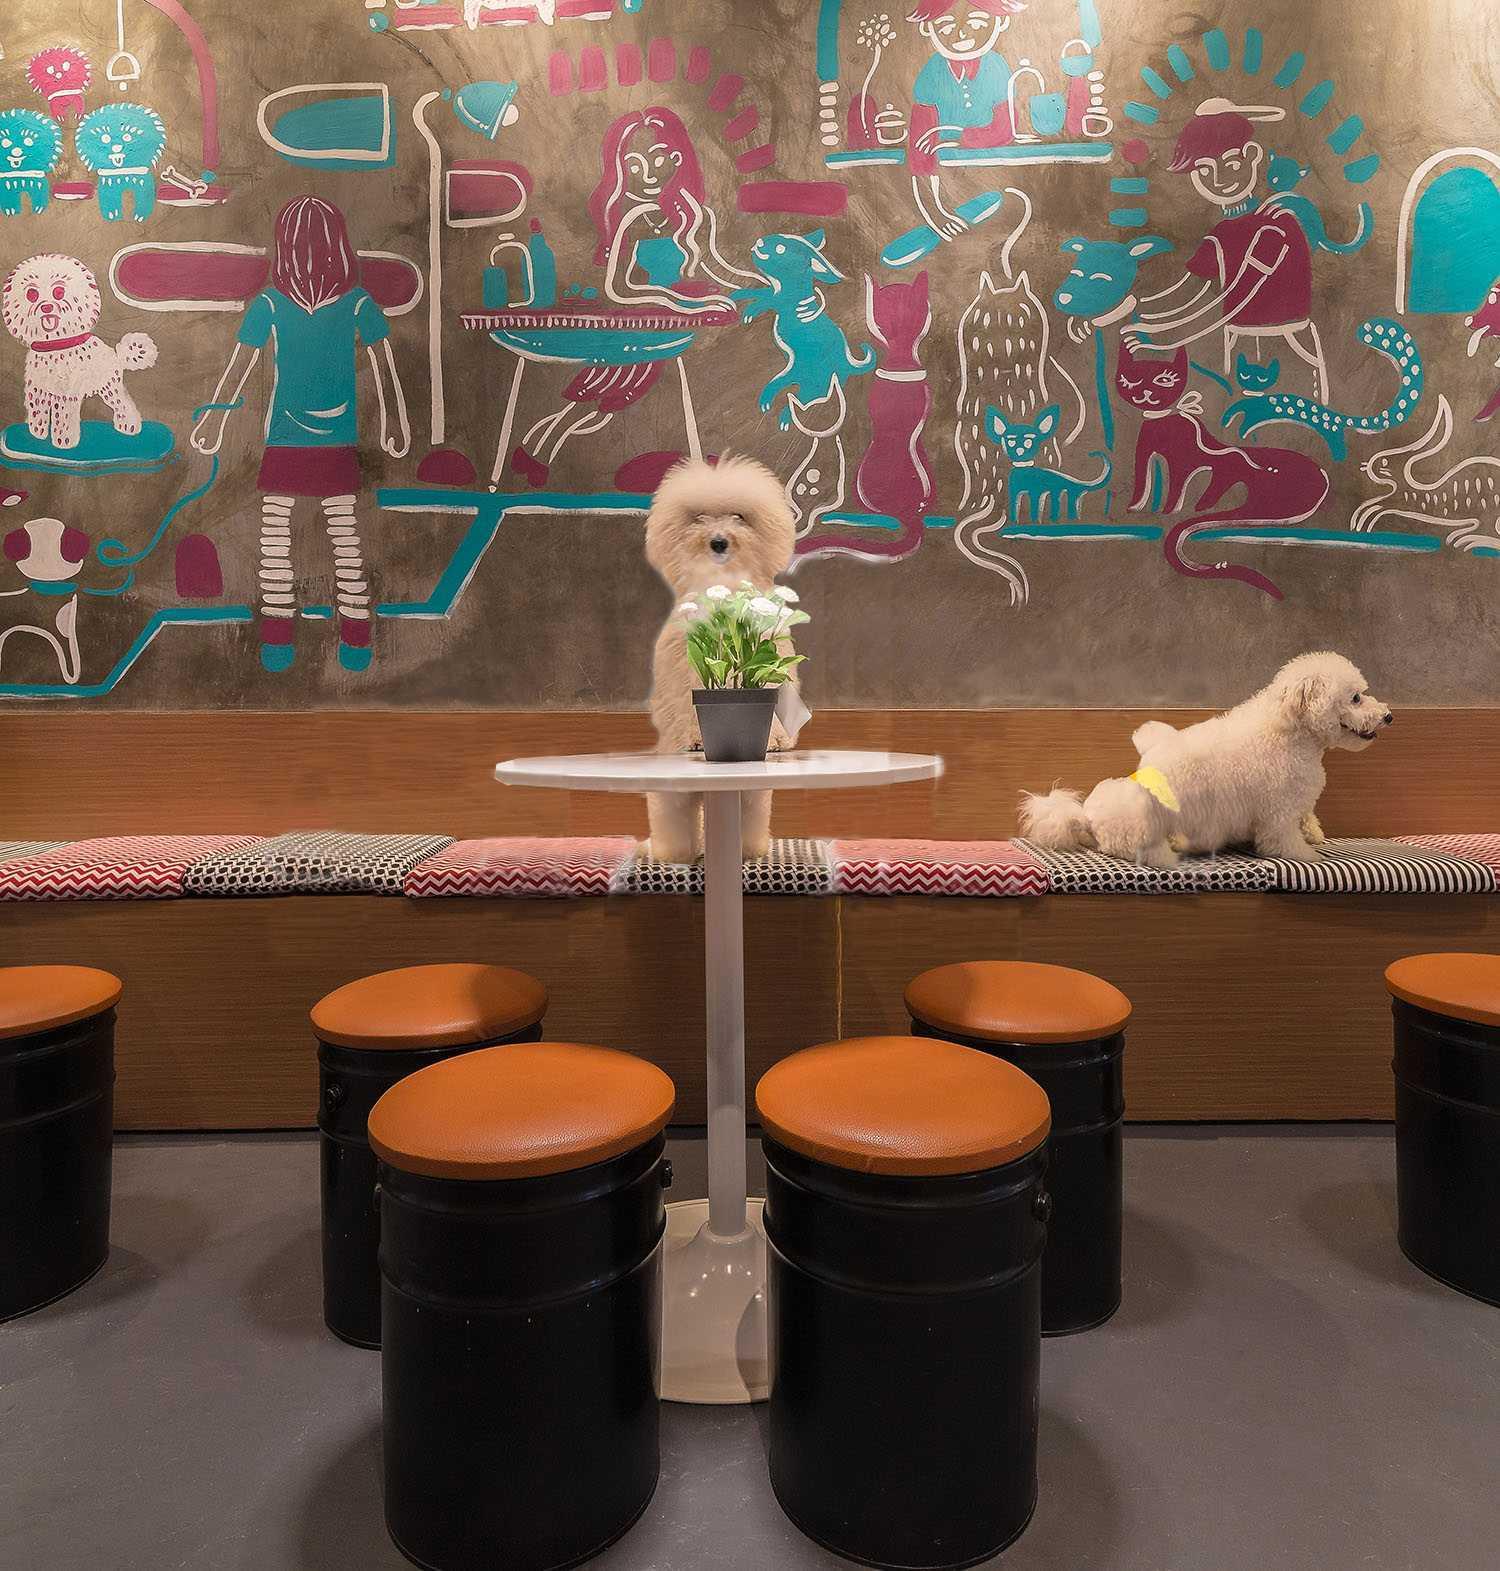 Evonil Architecture Barkbershop Pet Grooming Studio & Cafe Puri, Jakarta, Indonesia Puri, Jakarta, Indonesia Pets Area Modern  13210